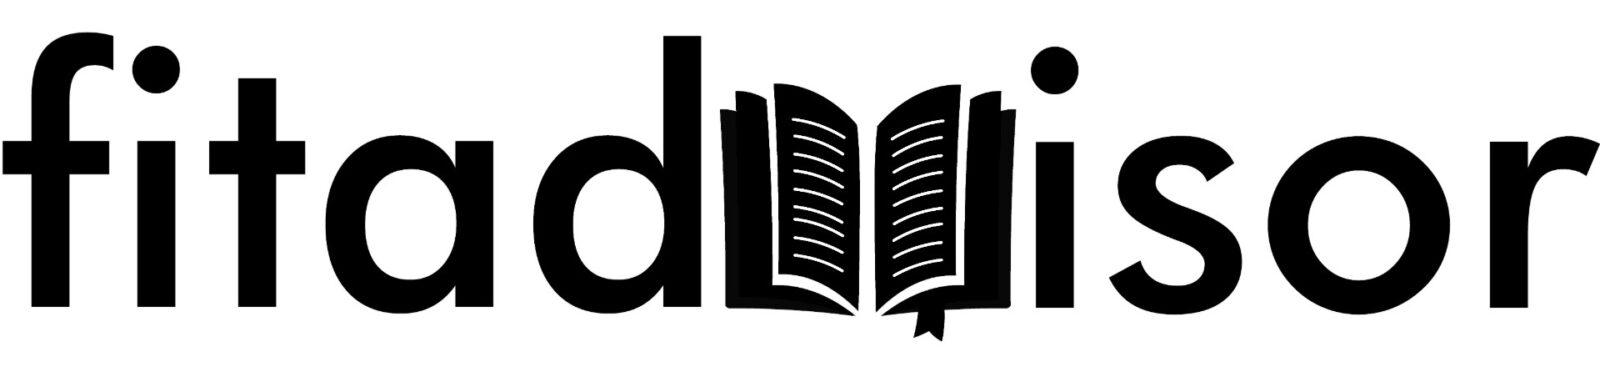 fitadvisor logo